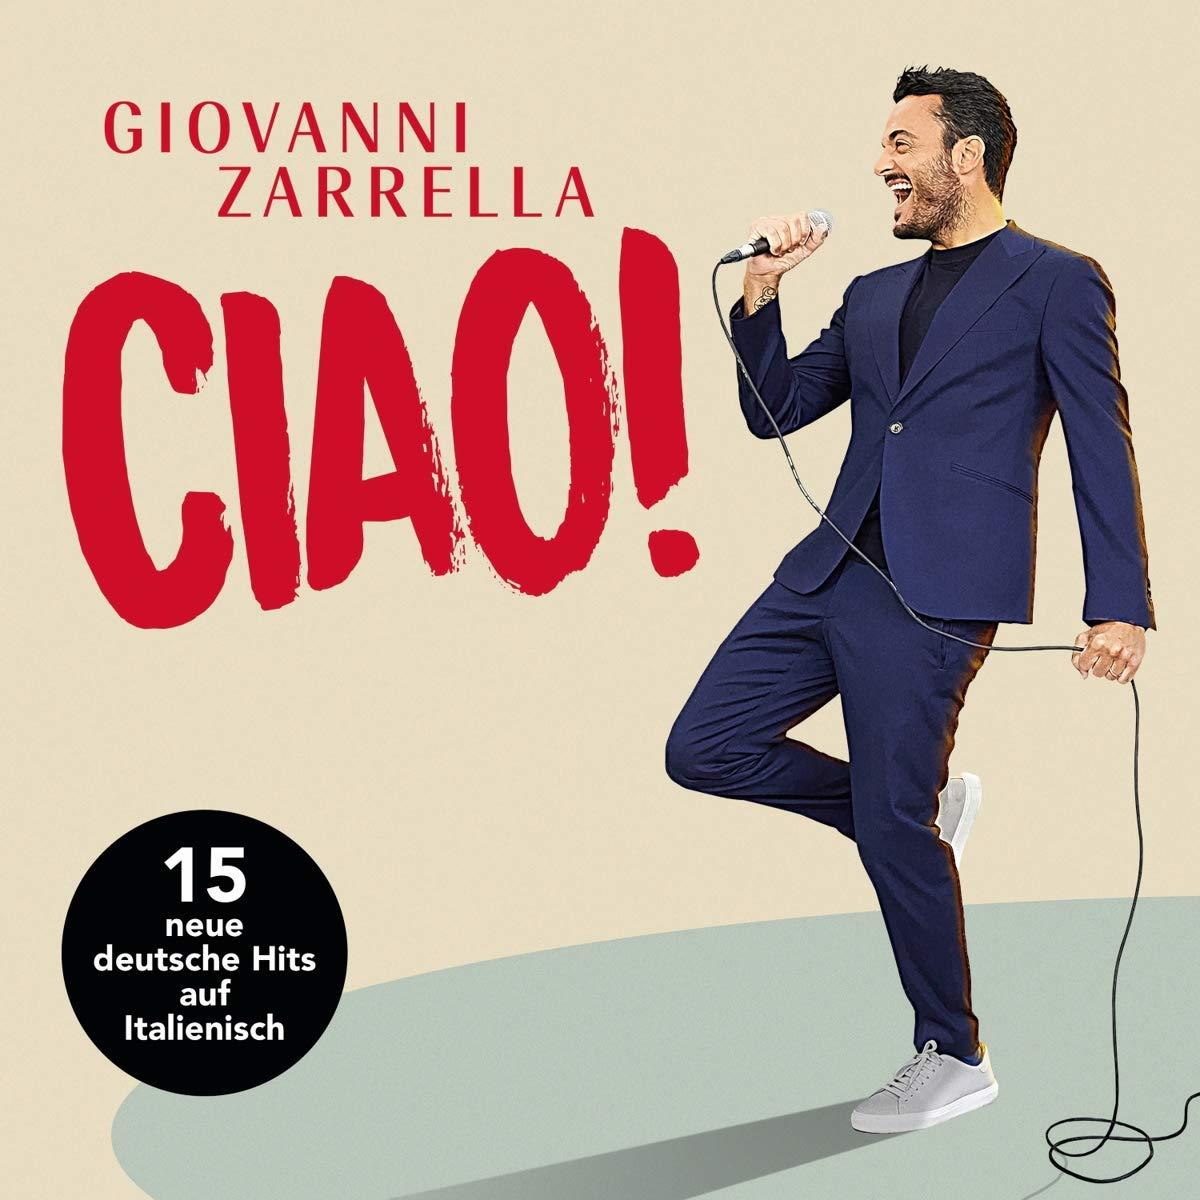 GIOVANNO ZARRELLA * CIAO! (CD) - Auch als Limitierte Fanbox Edition erhältlich!